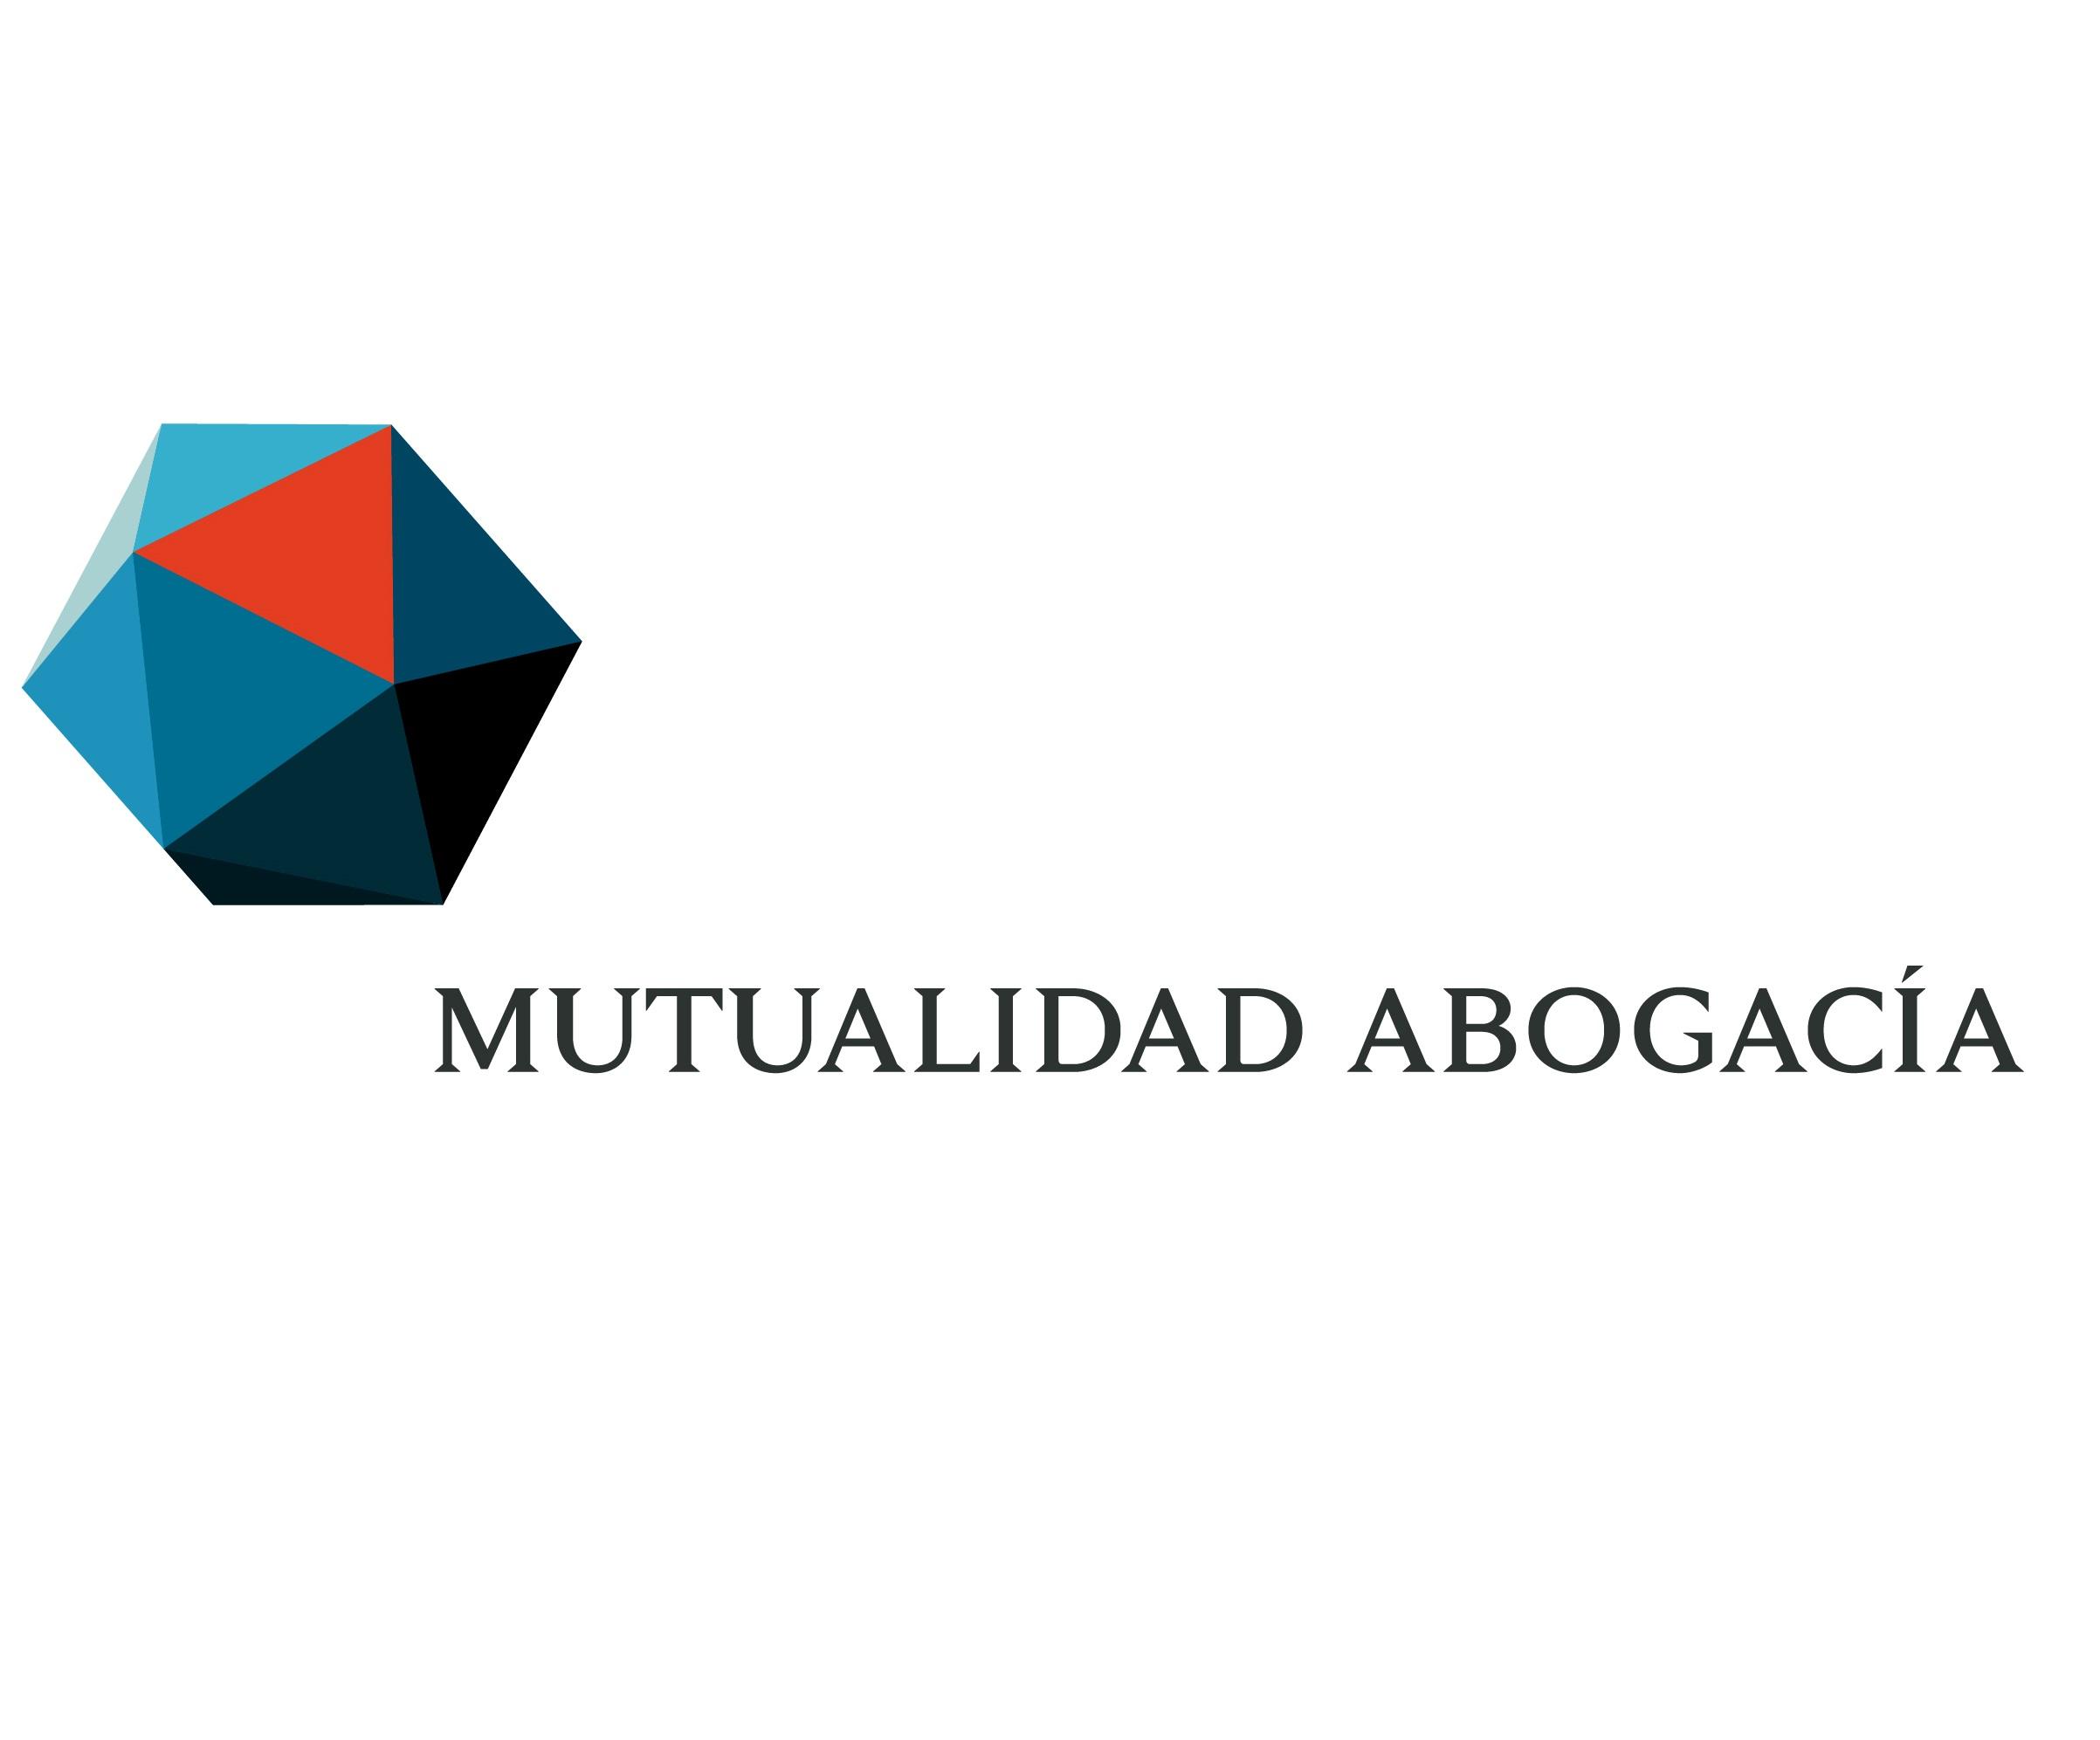 Mutualidad de la abogacia logo